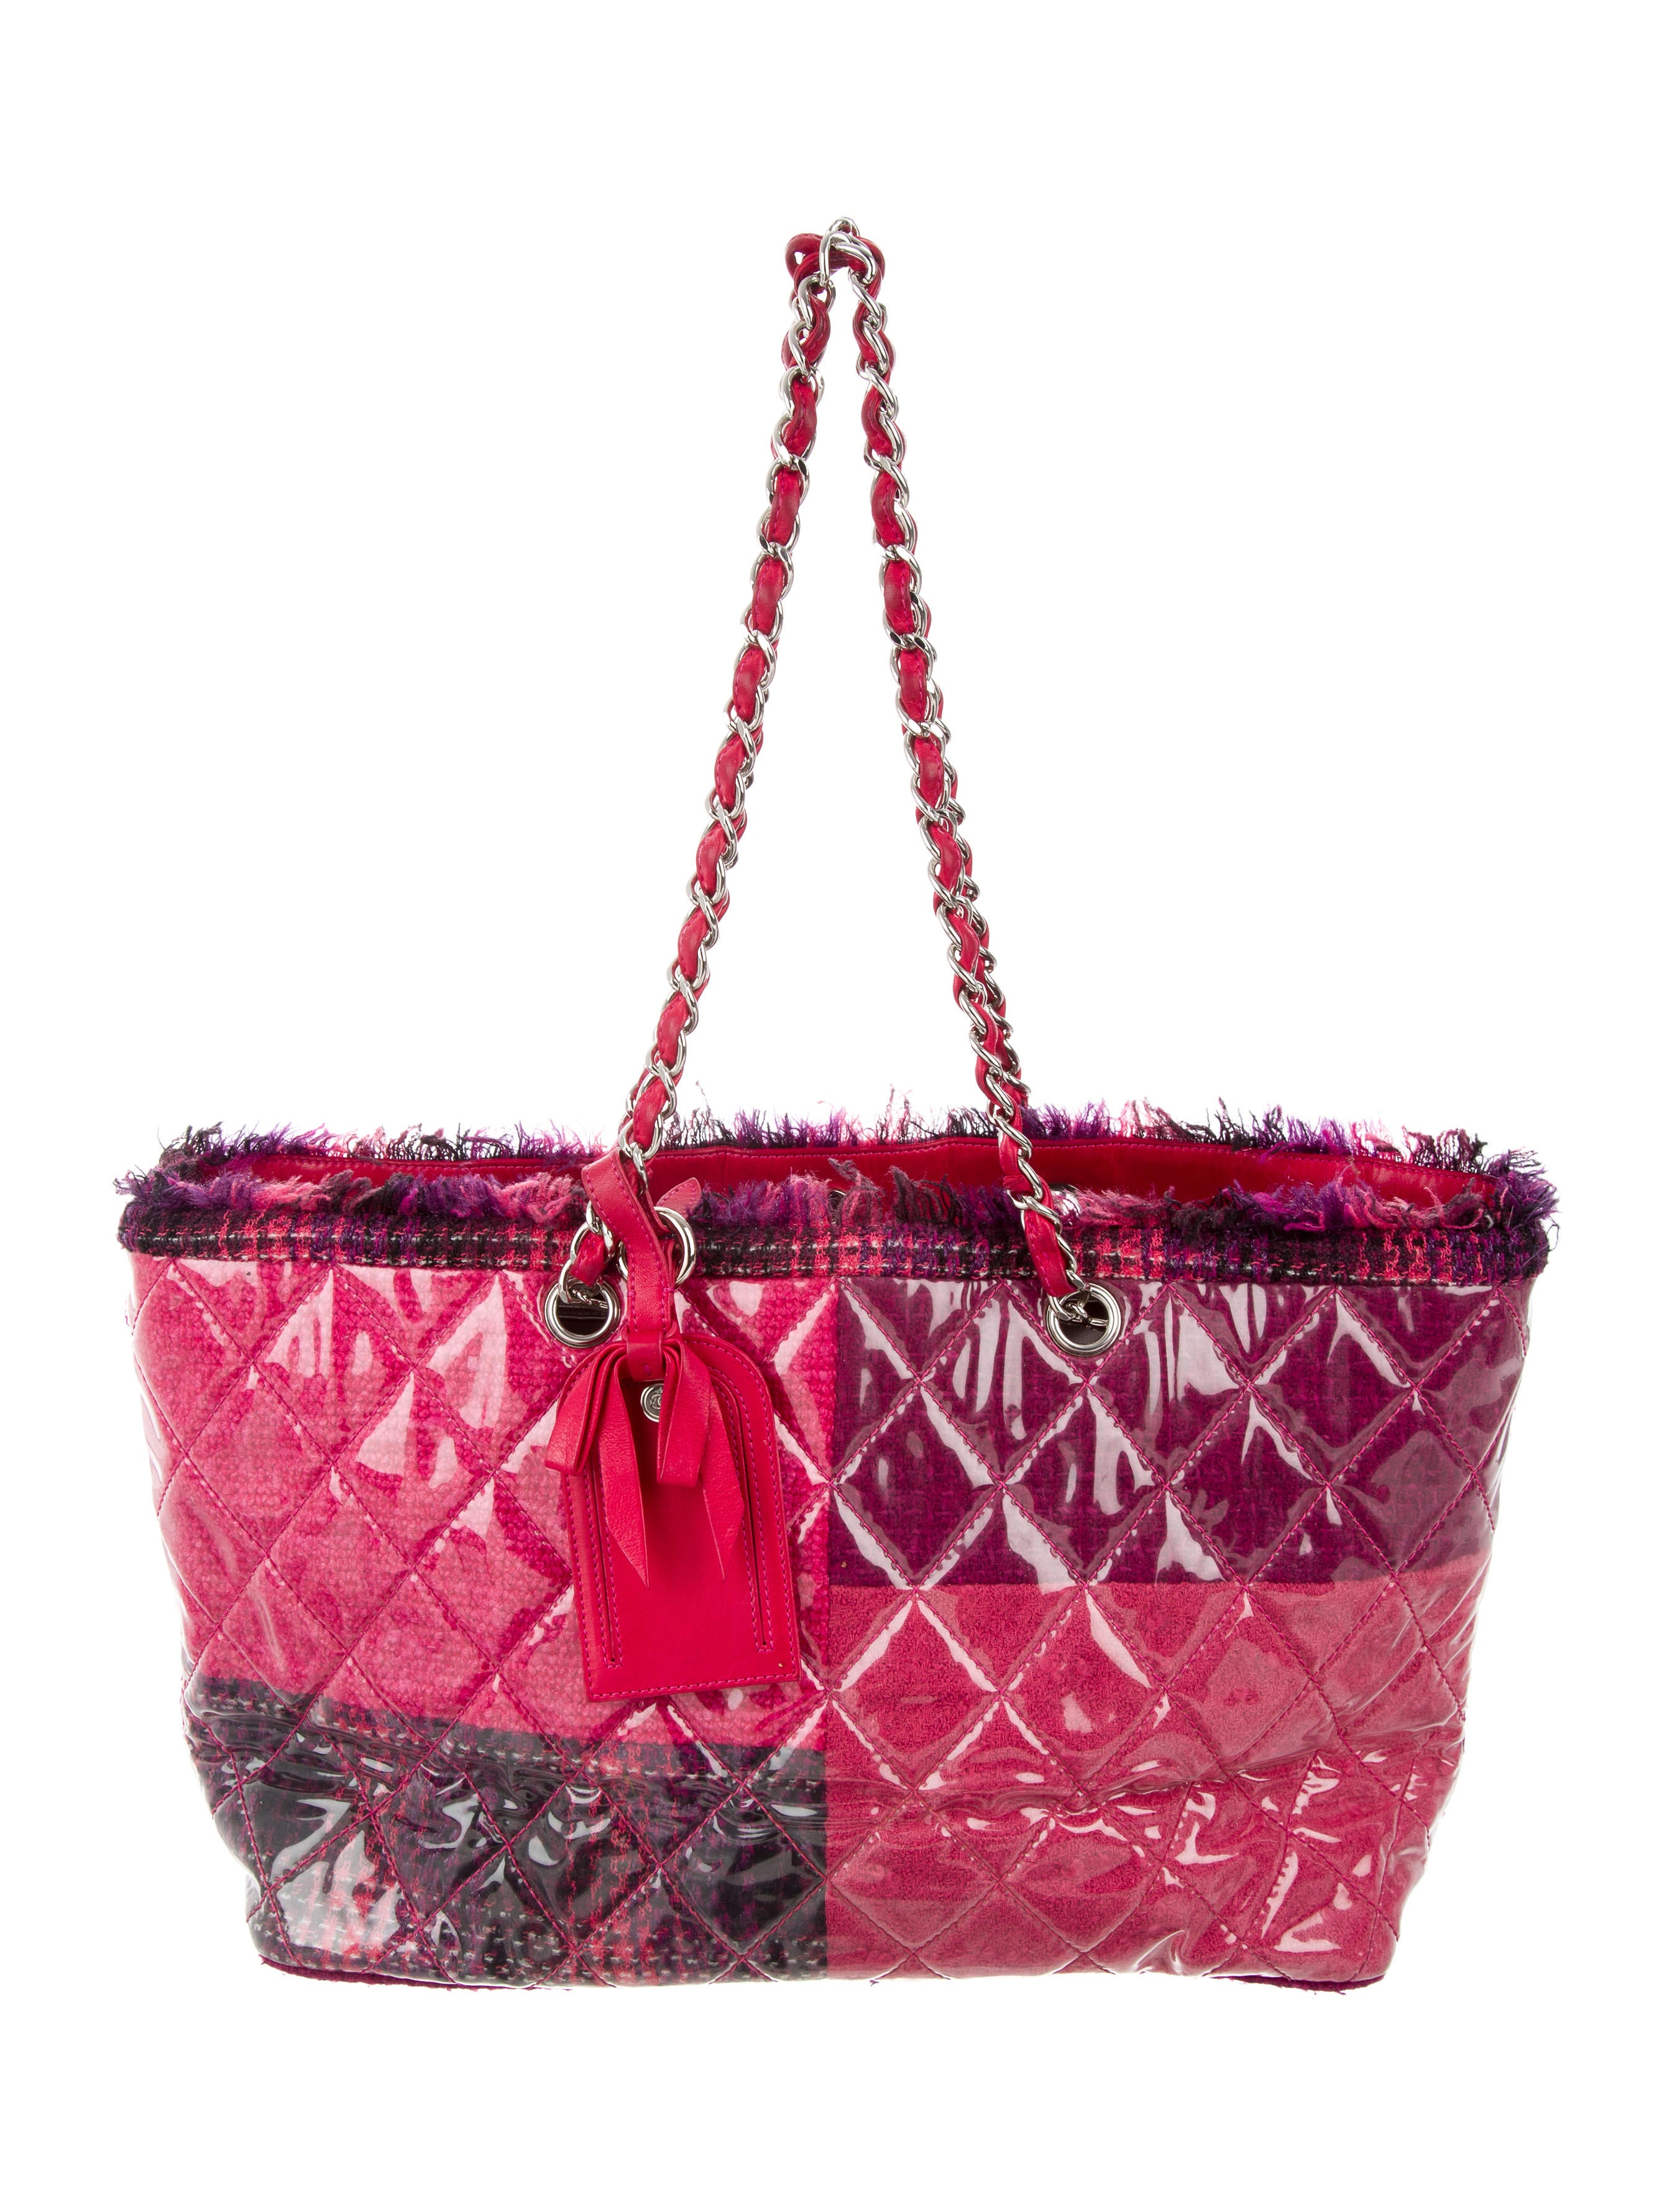 6b9b852c1efb81 Lyst - Women's Chanel Totes and shopper bags